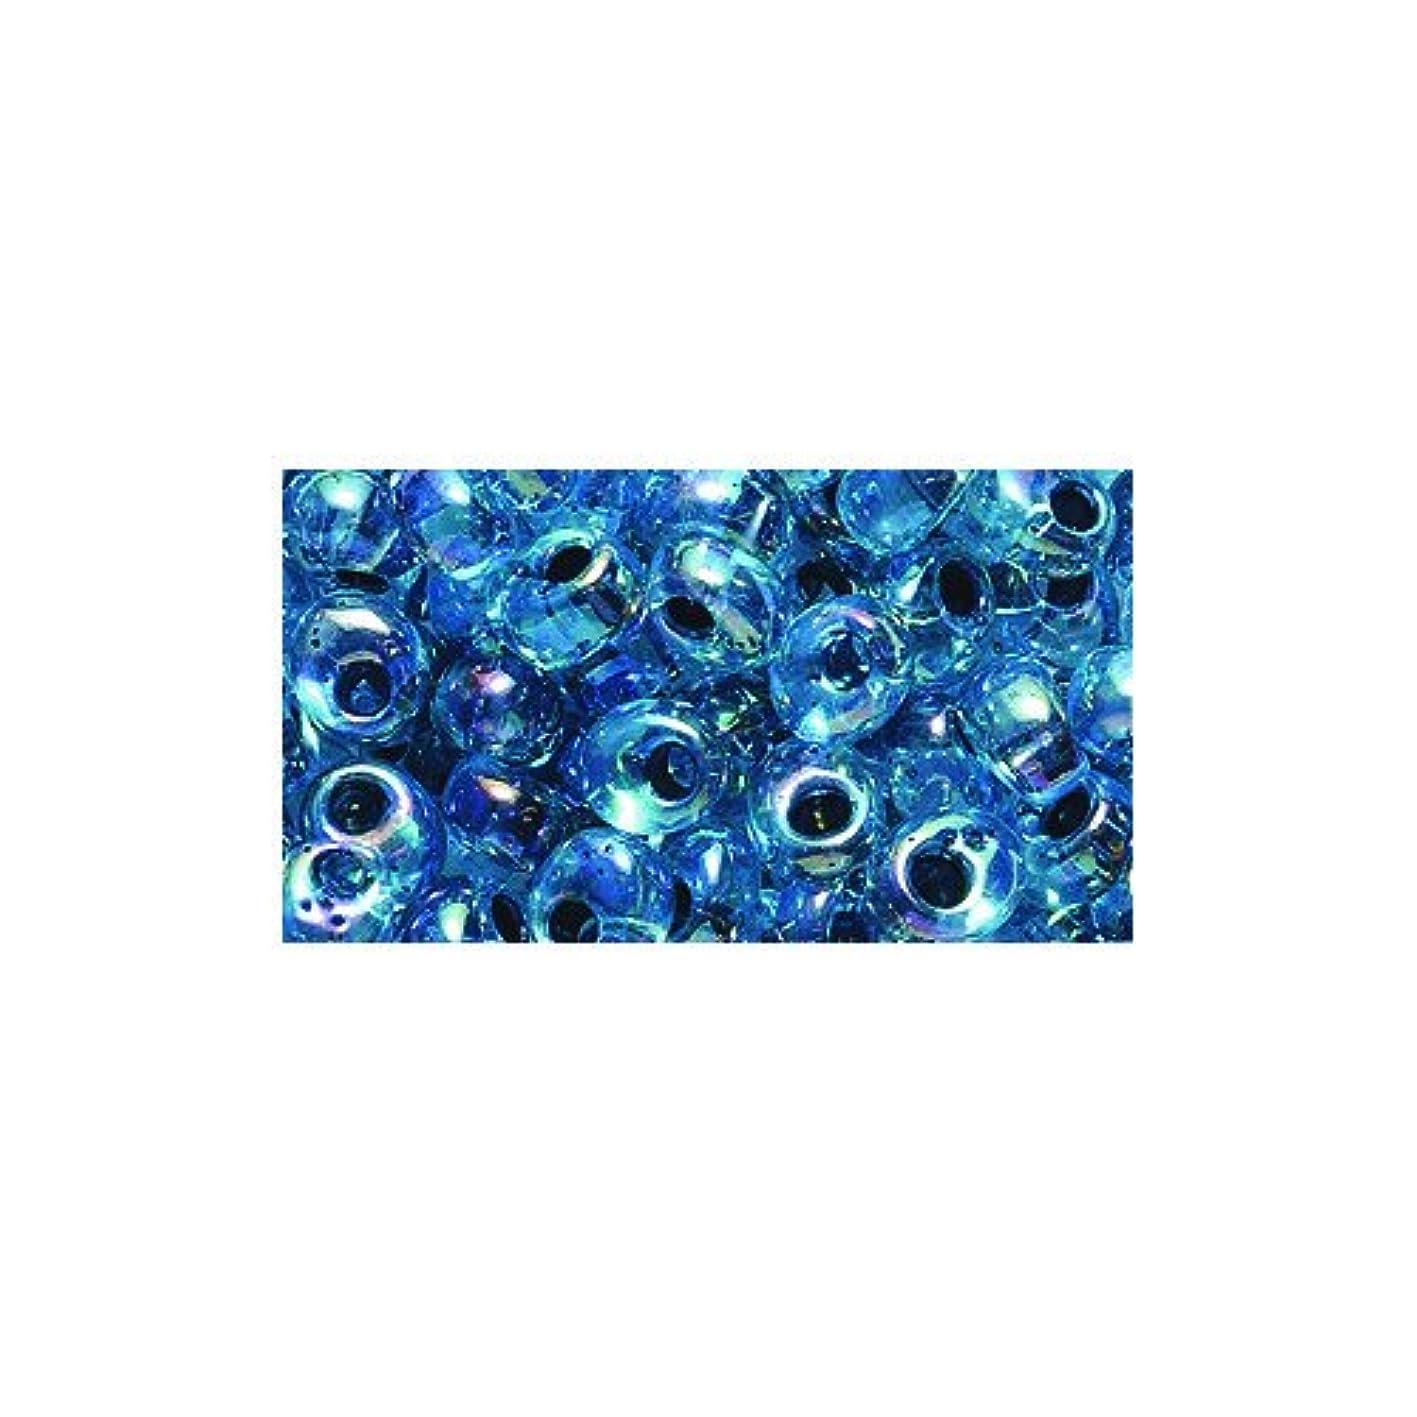 Shipwreck Beads Miyuki Seed Bead, Drop Magatama Topaz Lined Aqua Aurora Borealis, 4mm joqnbgwrofs039